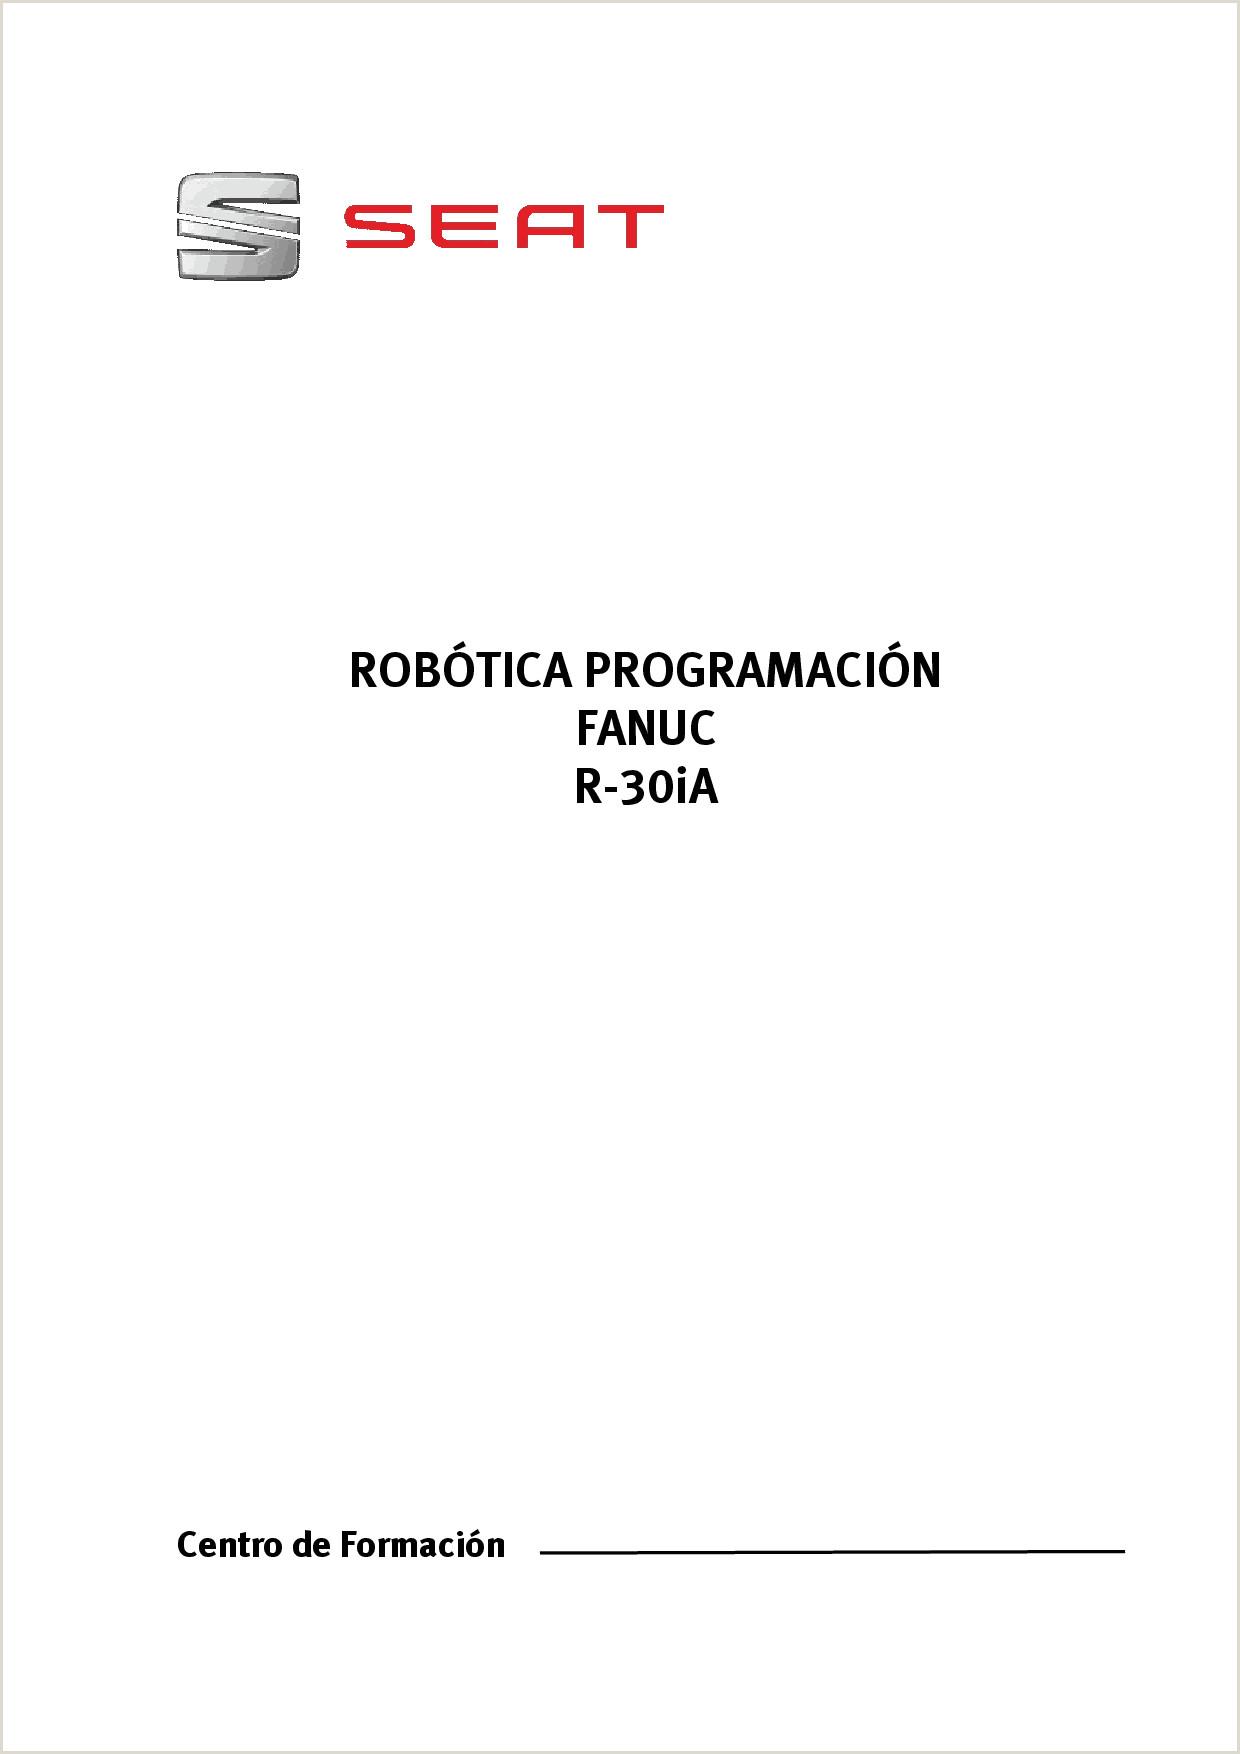 Instructivo formato Unico De Hoja De Vida Manual Fanucr 30i A Manual De Programa§£o Fanuc Docsity